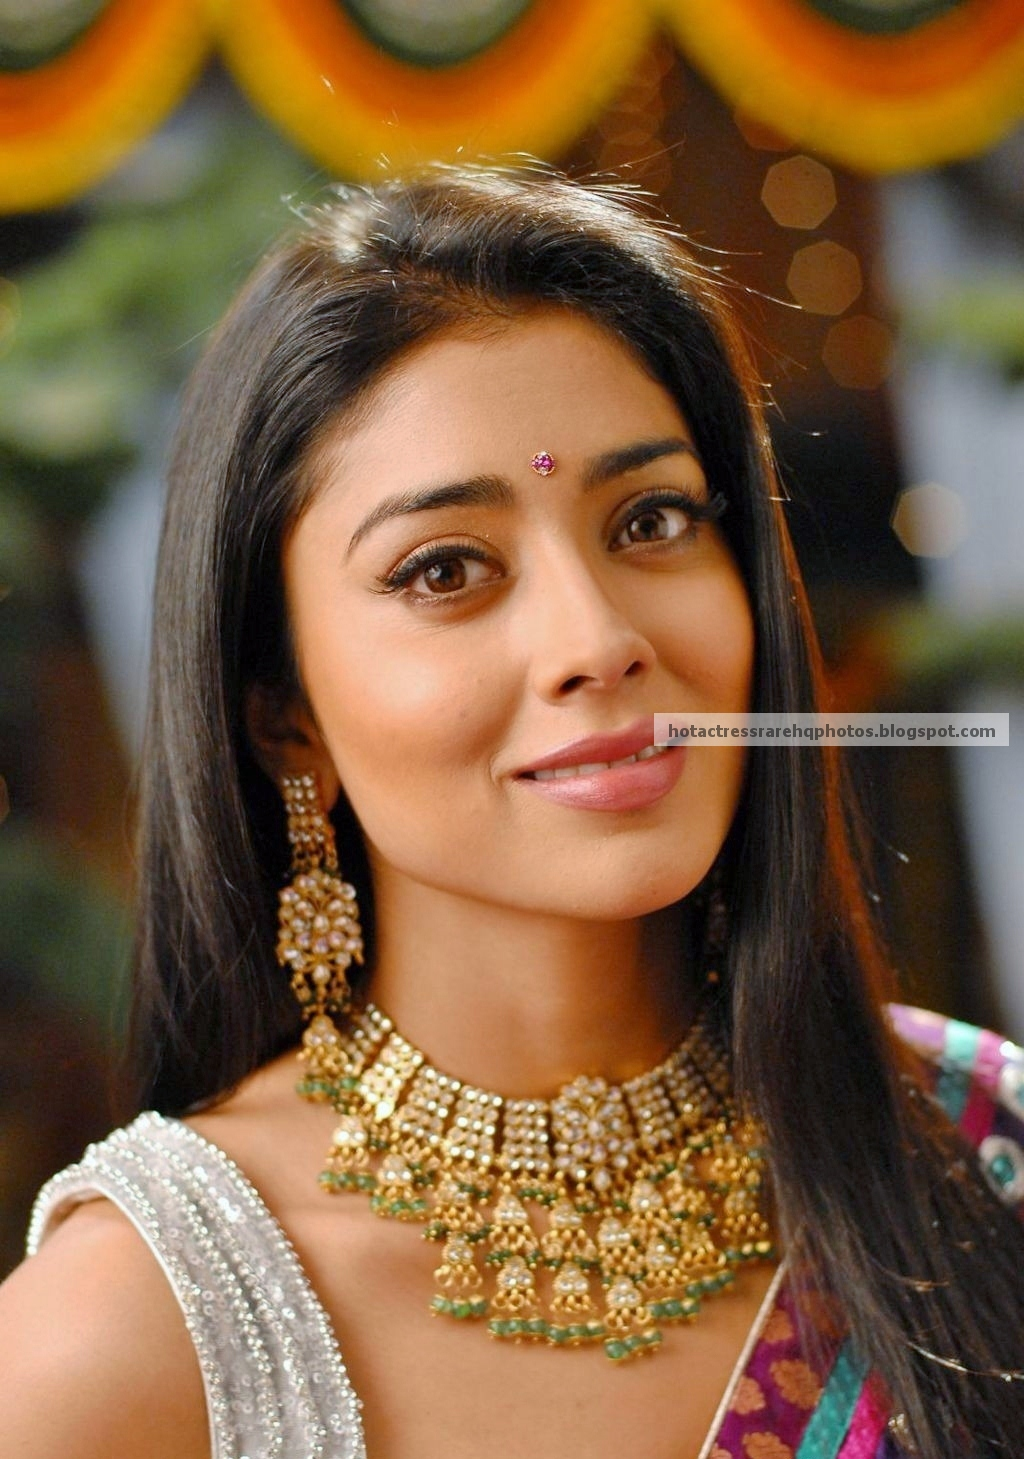 indian beauty shriya ravishing saran actress saree uhq rare hq pink